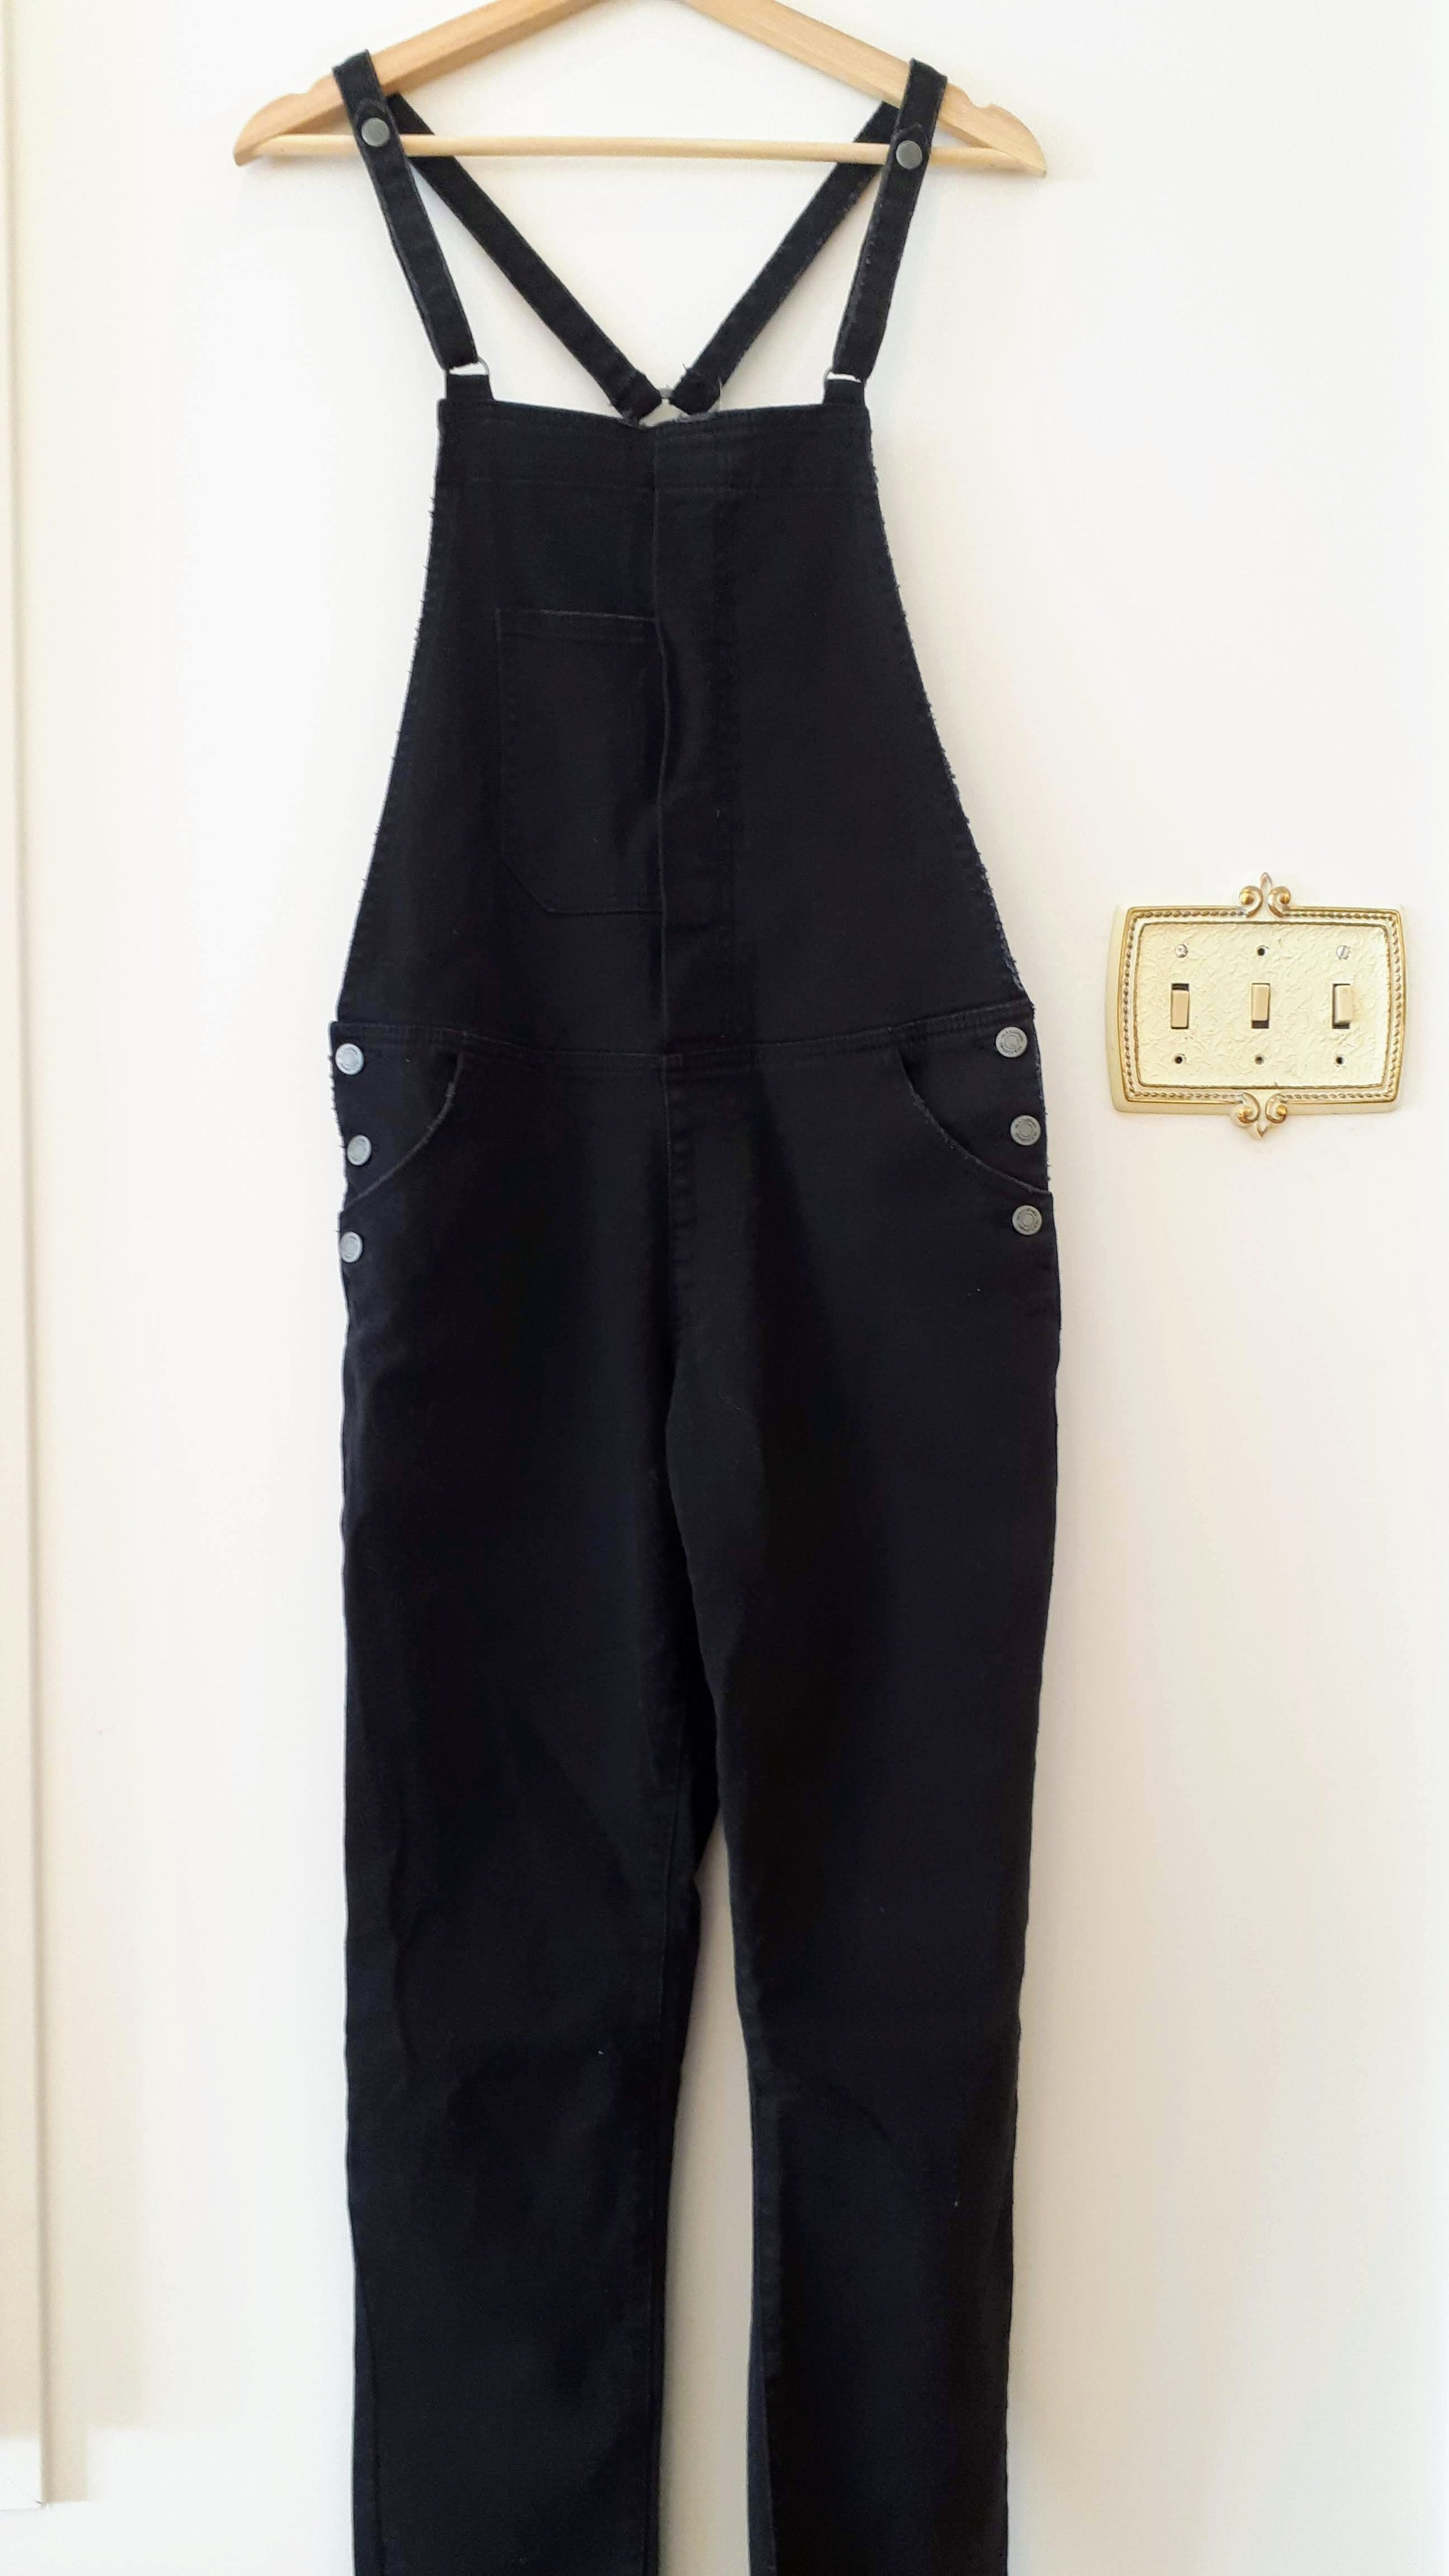 Vila Clothes overalls; Size S, $32